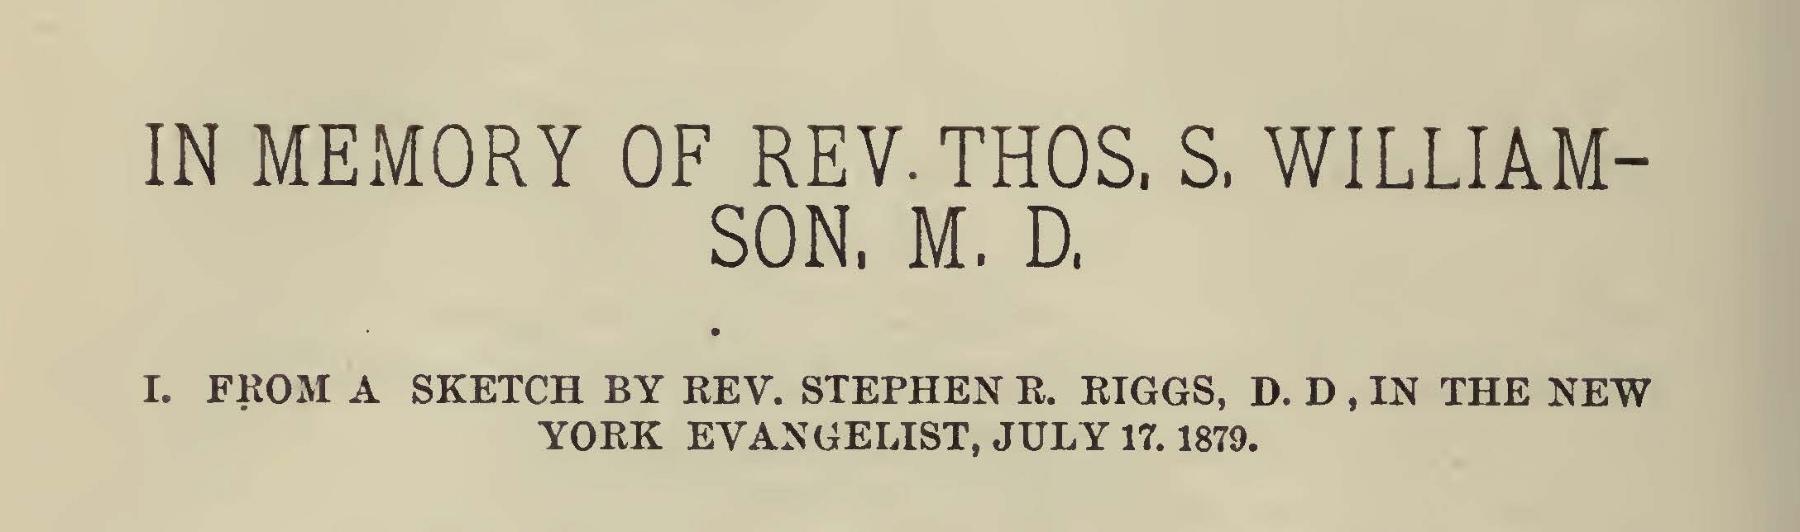 Riggs, Stephen Return, In Memory of Rev. Thos. S. Williamson, M.D. Title Page.jpg